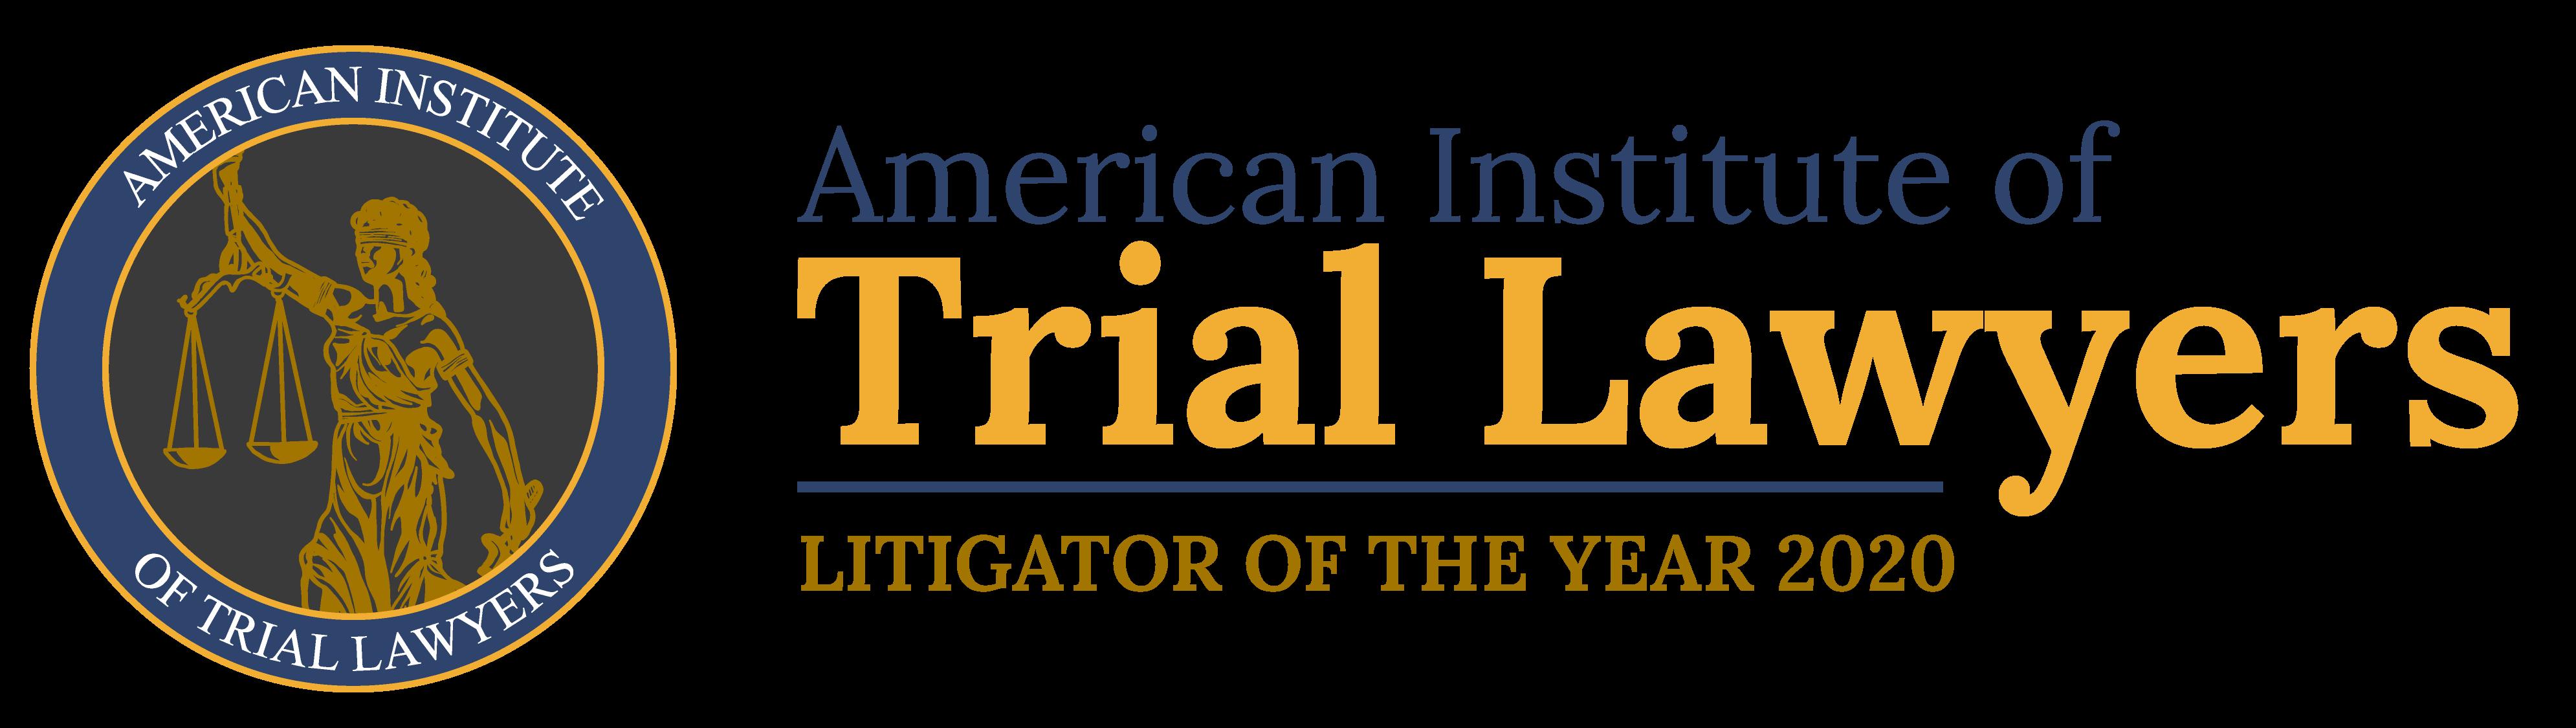 Litigator-of-the-Year-20 (1)